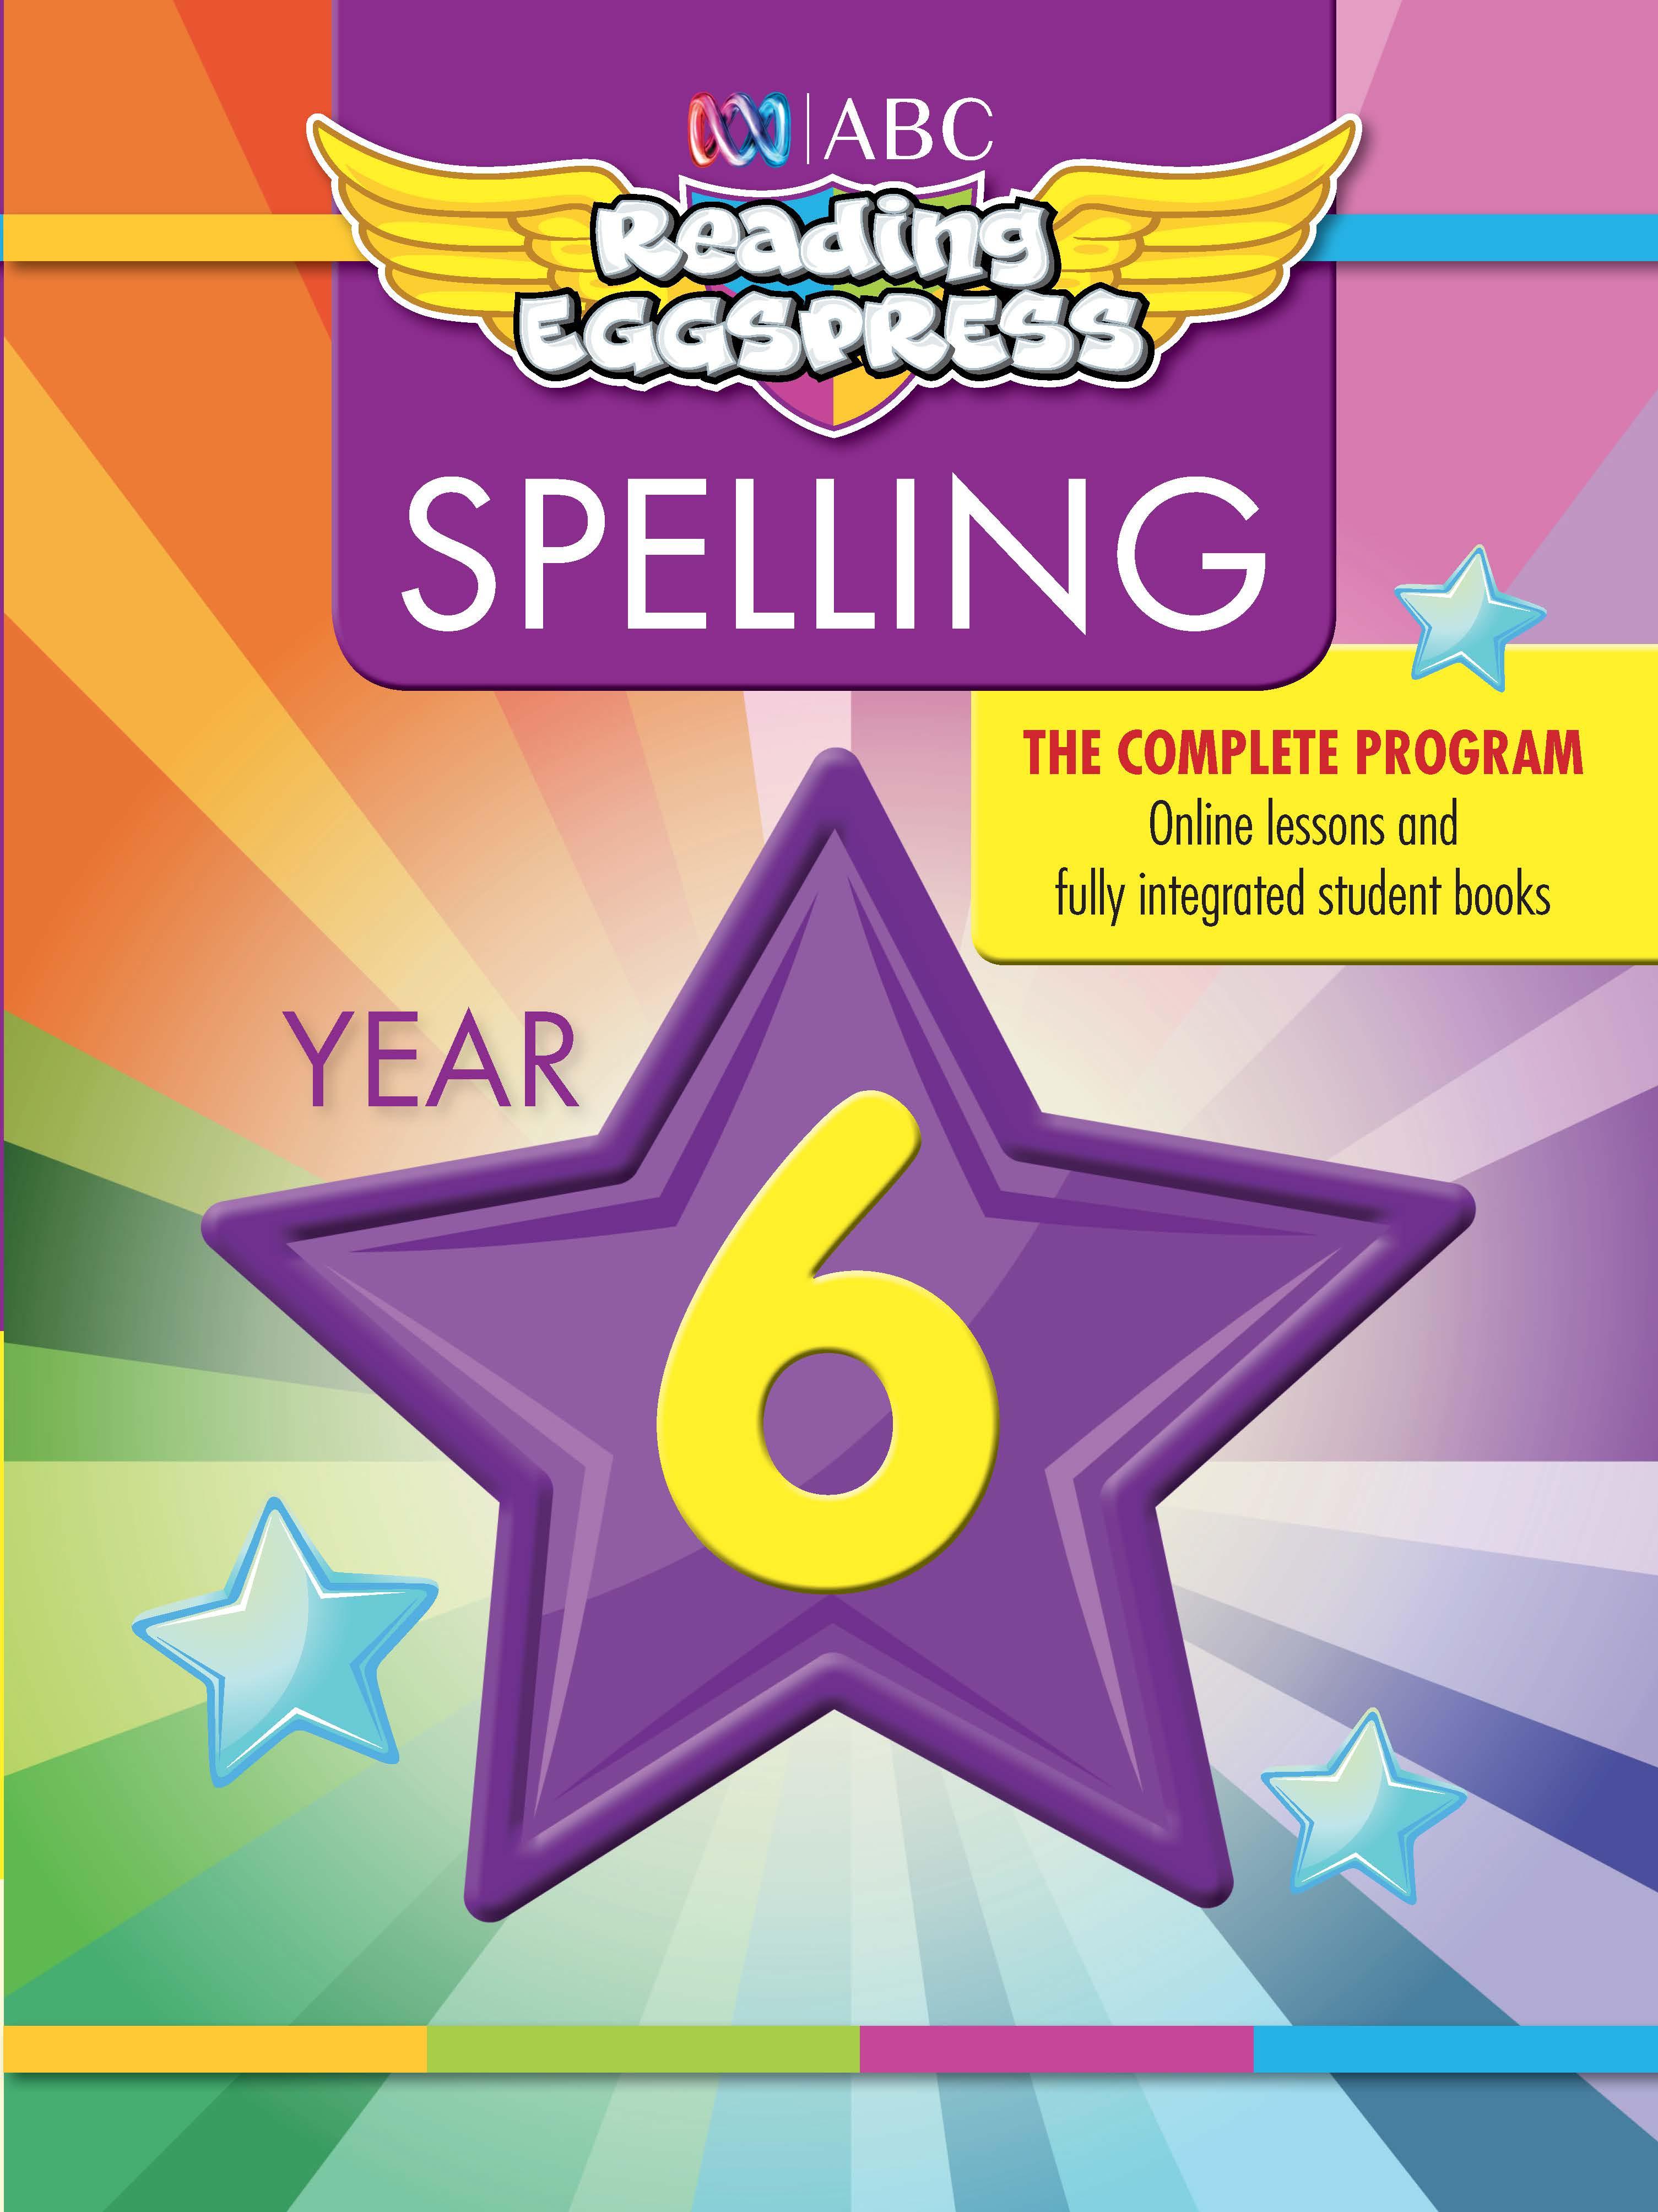 ABC Reading Eggspress Spelling Workbook Year 6